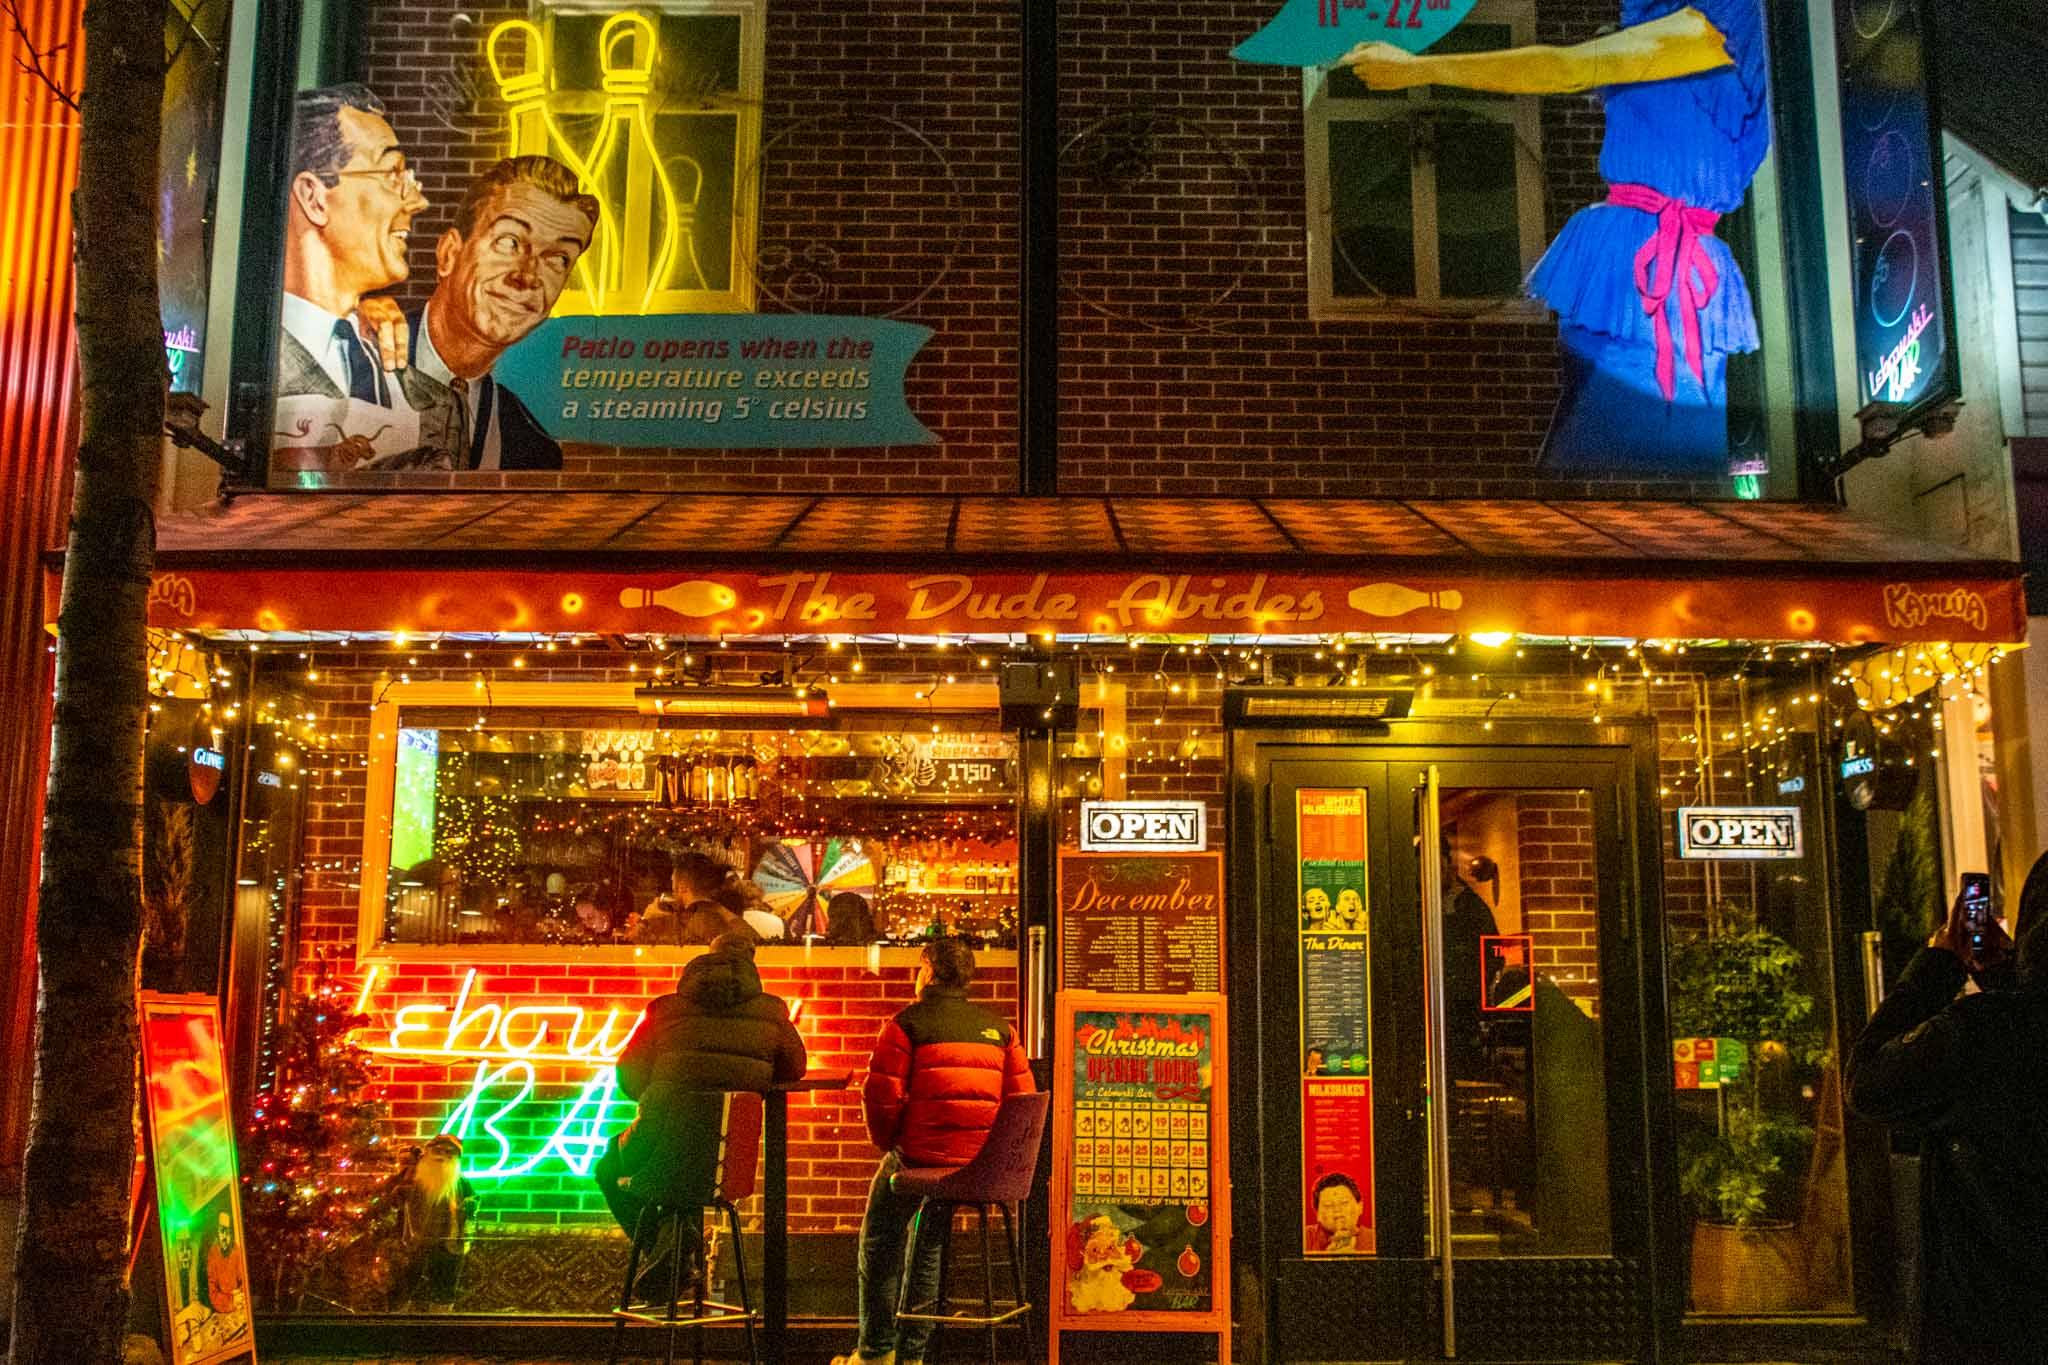 The exterior of the Lebowski Bar